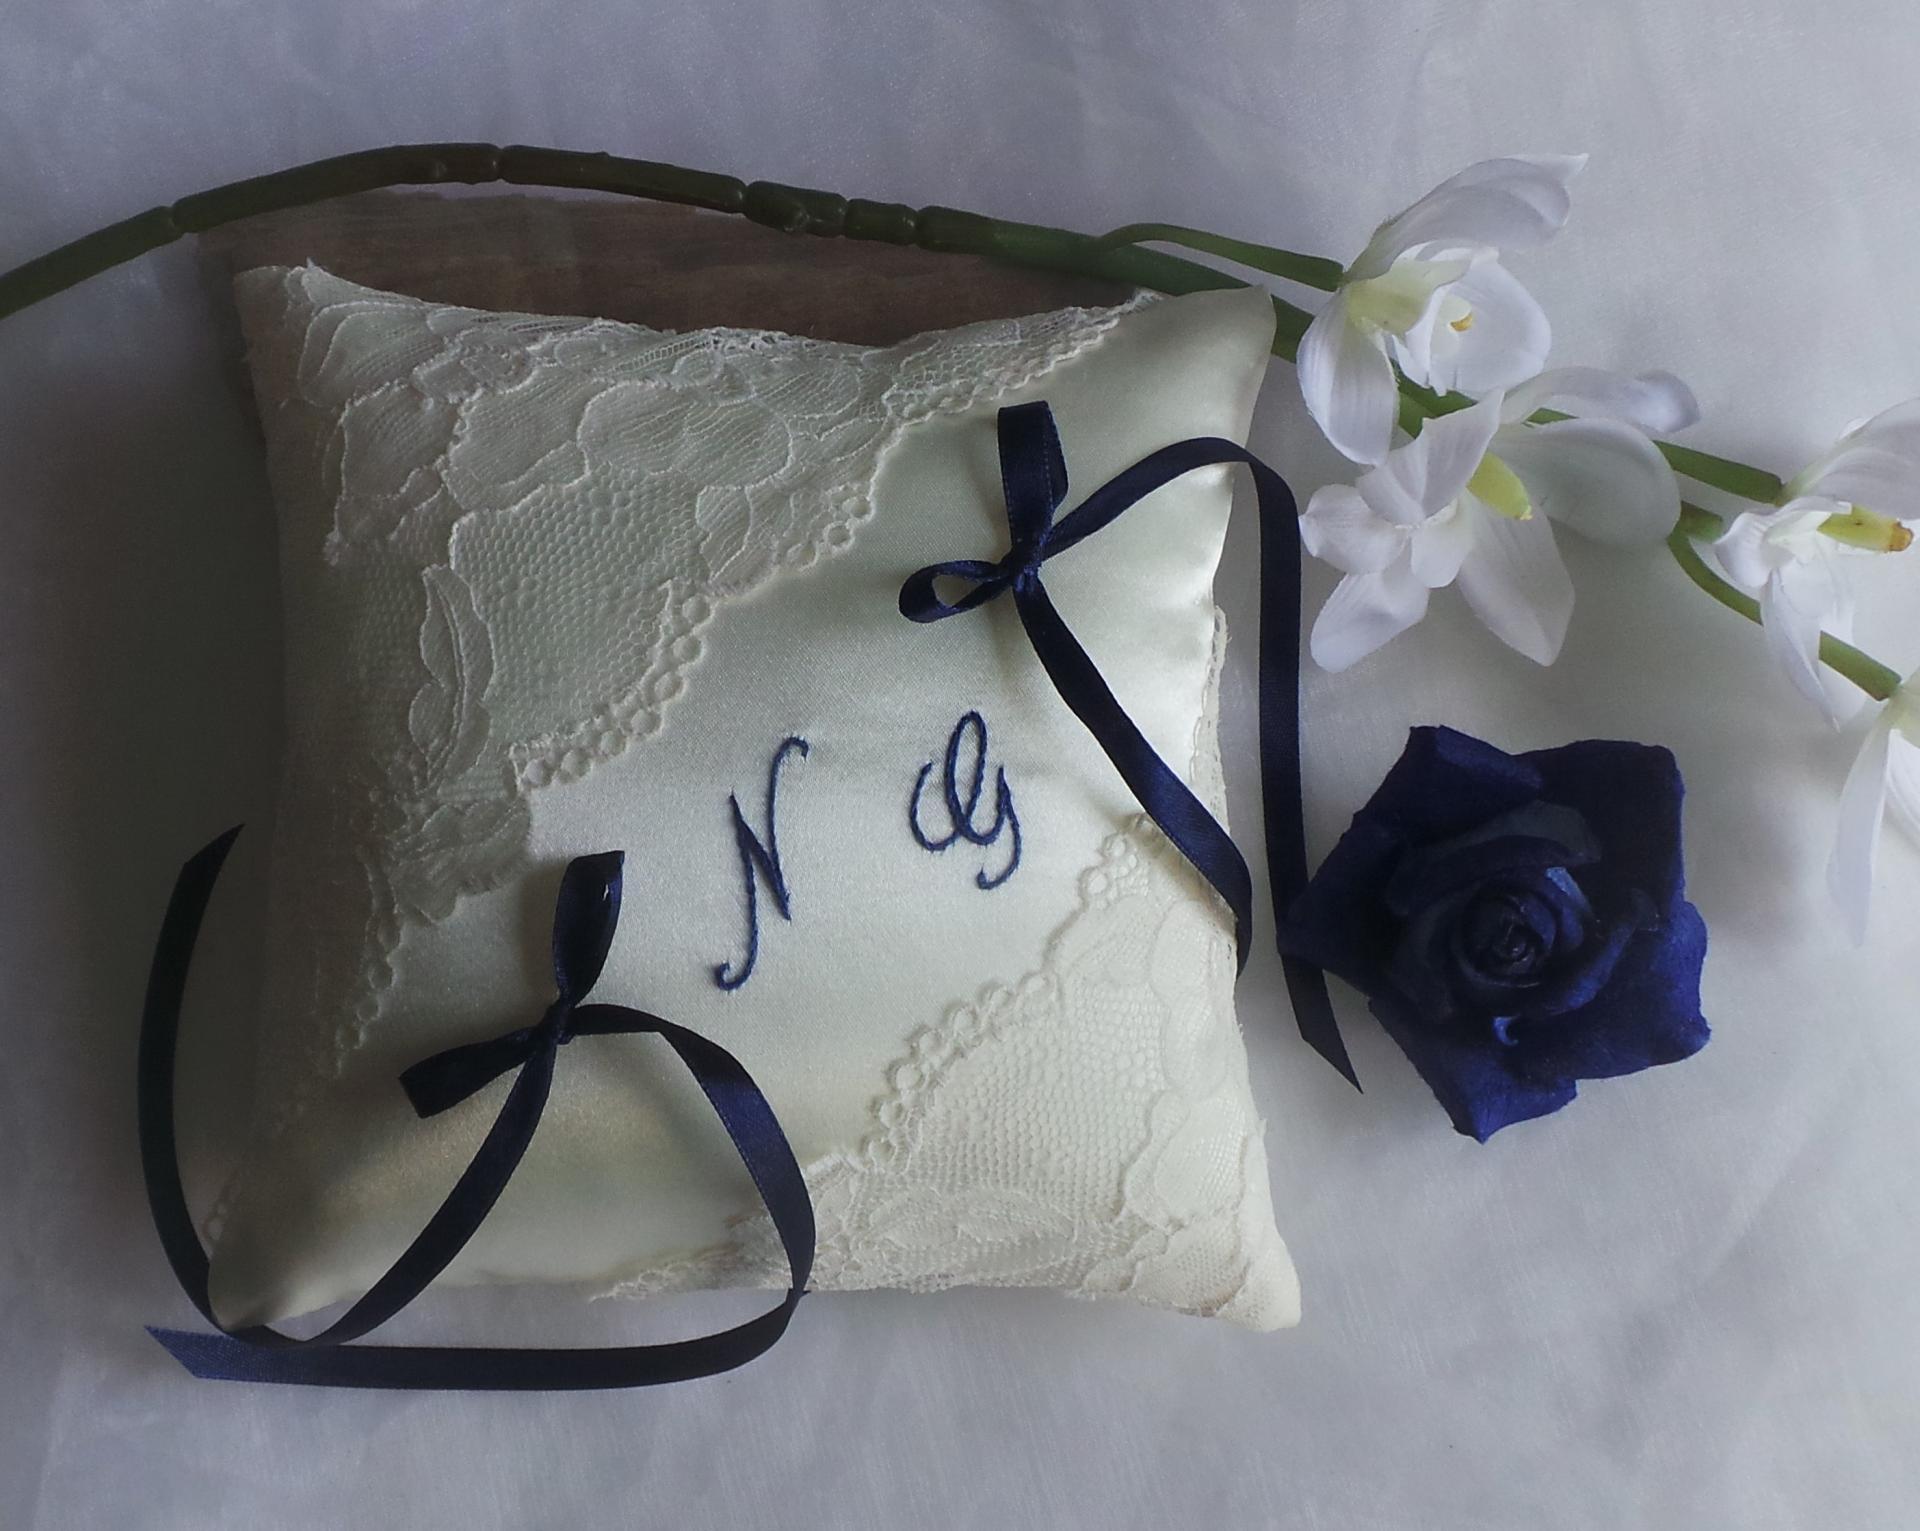 Coussin mariage chic bleu marine roi nuit 39